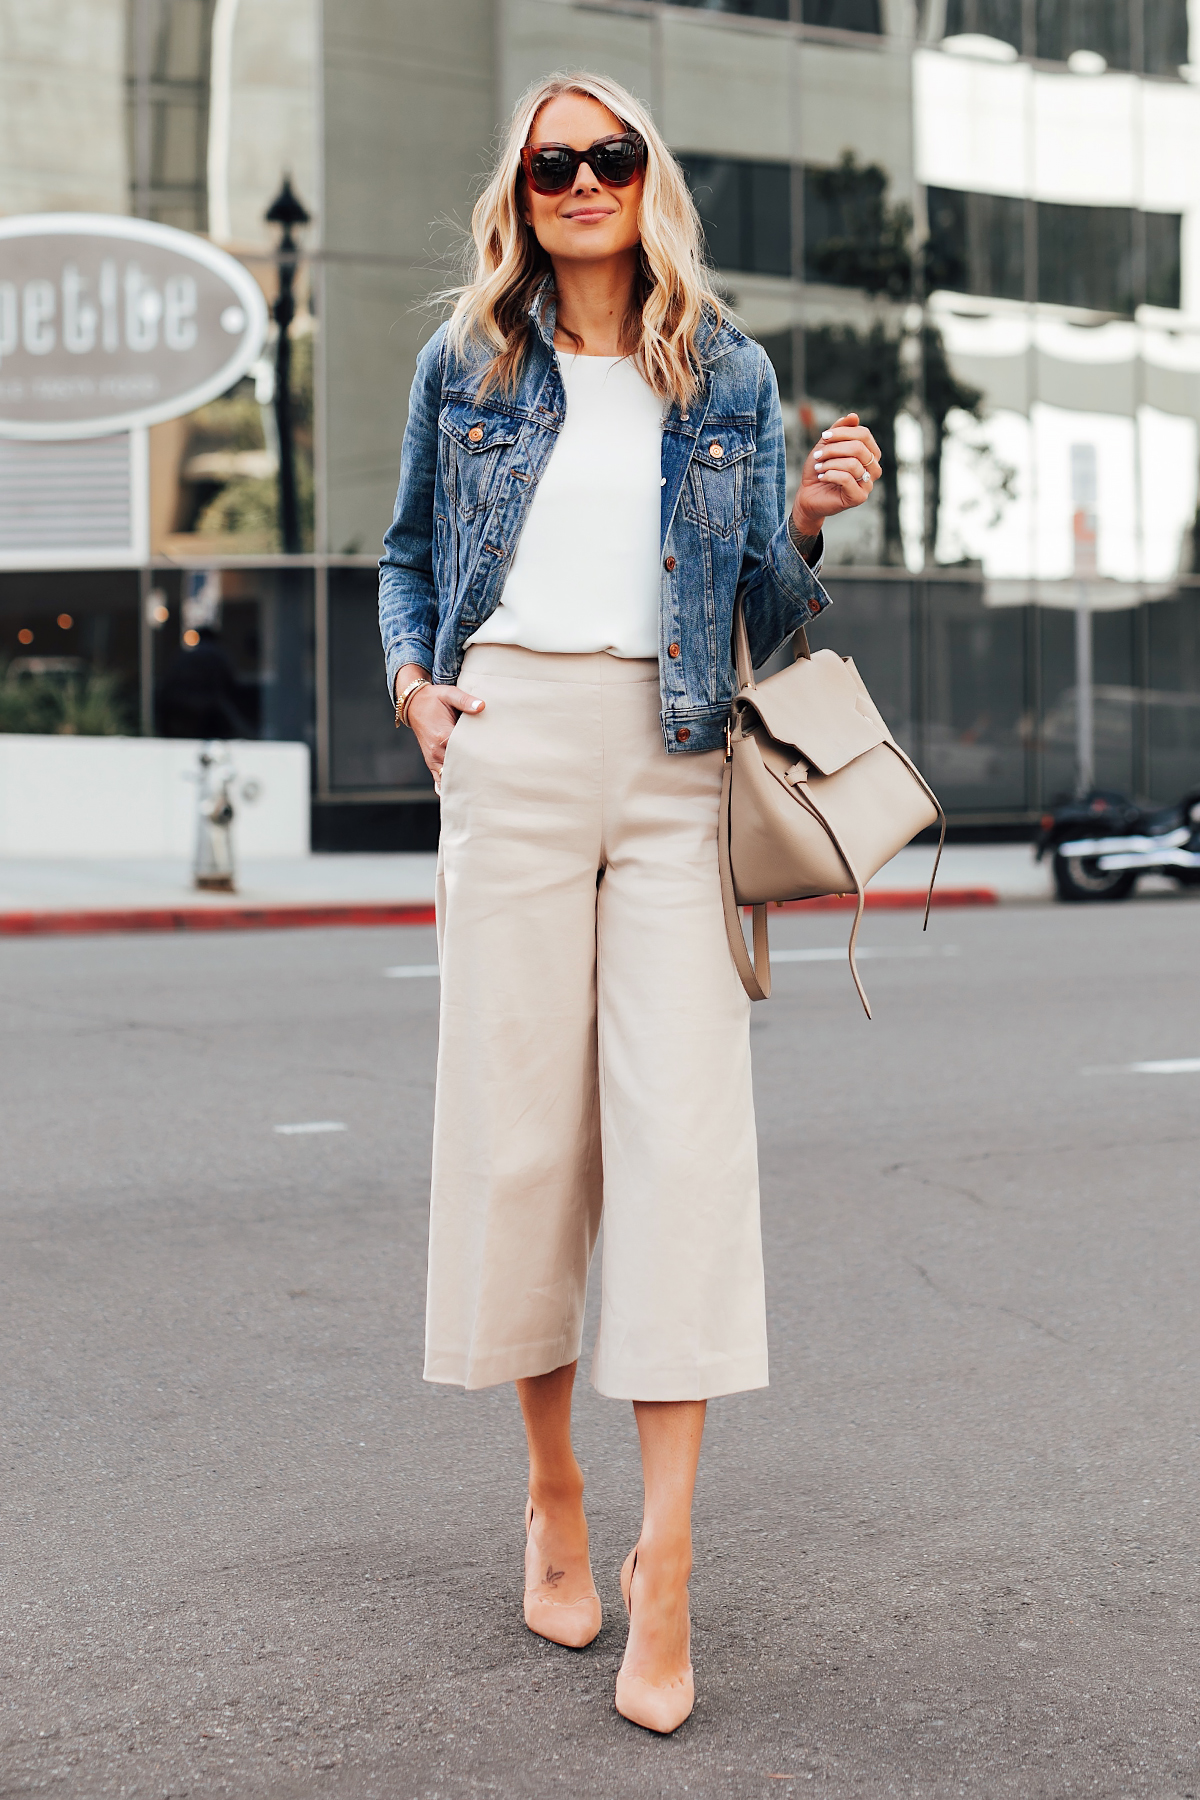 Fashion Jackson Wearing Denim Jacket White Top Ann Taylor Khaki Cropped Pants Nude Heels Celine Mini Belt Bag